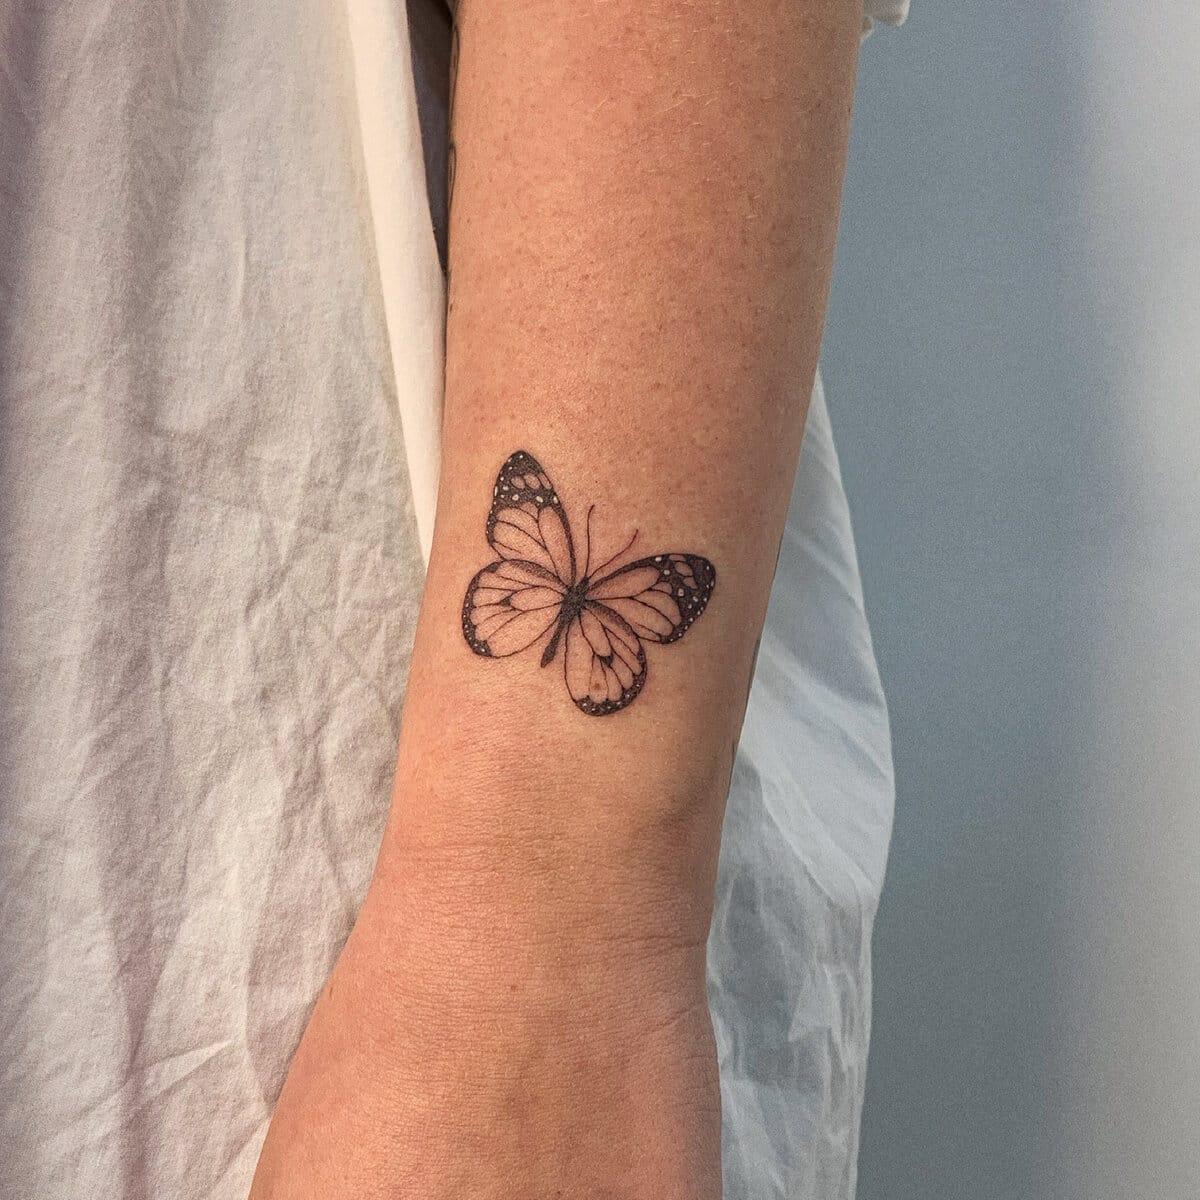 blanka bartosova tattoo artist butterfly arm